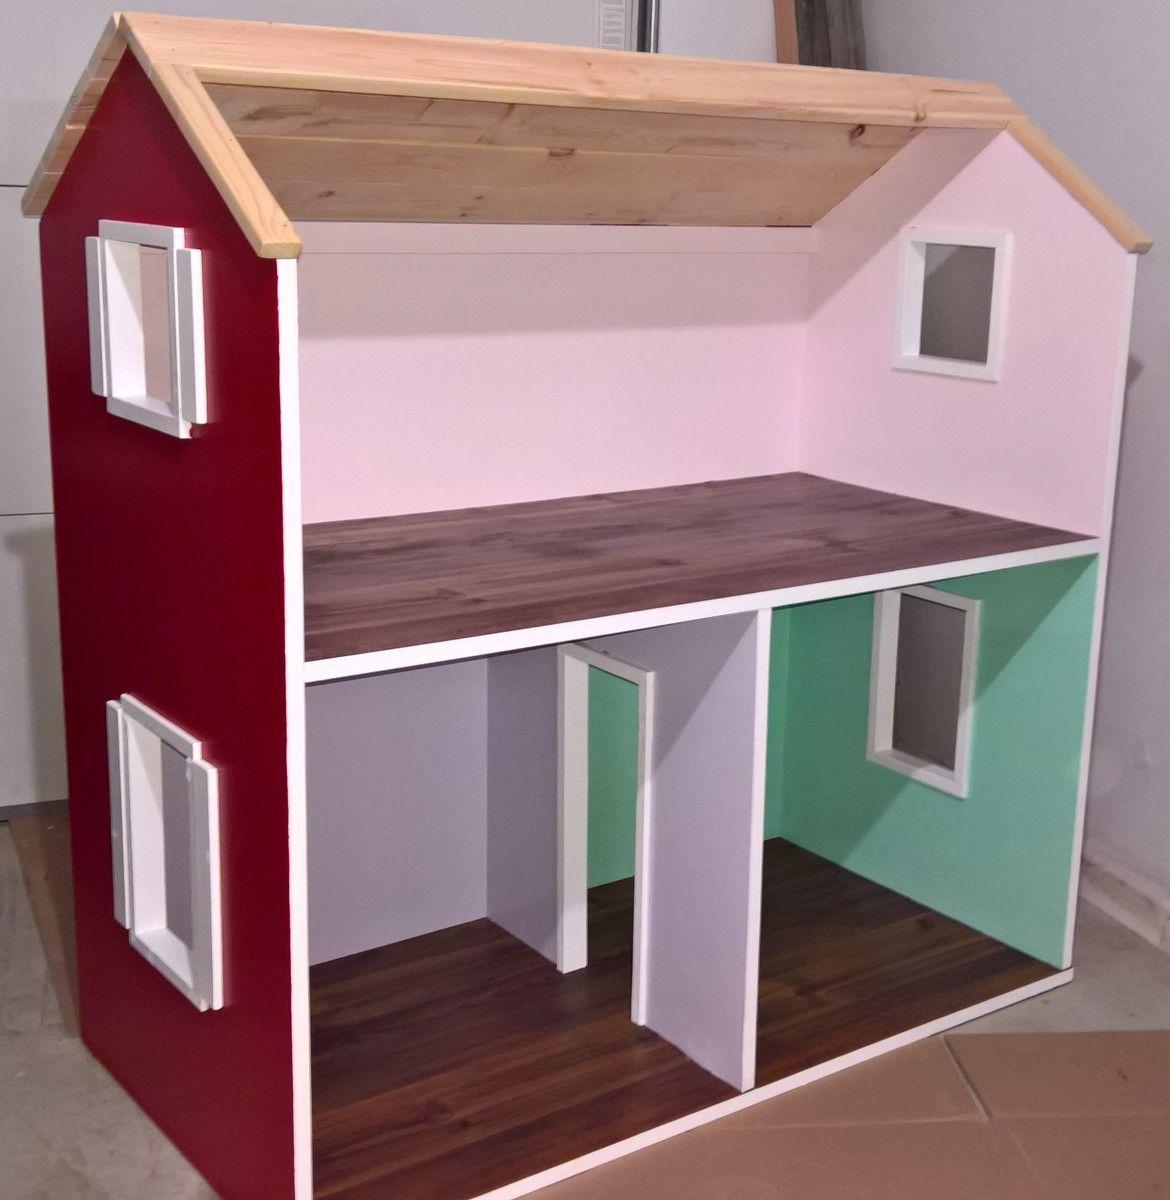 2 Story American Girl Dollhouse